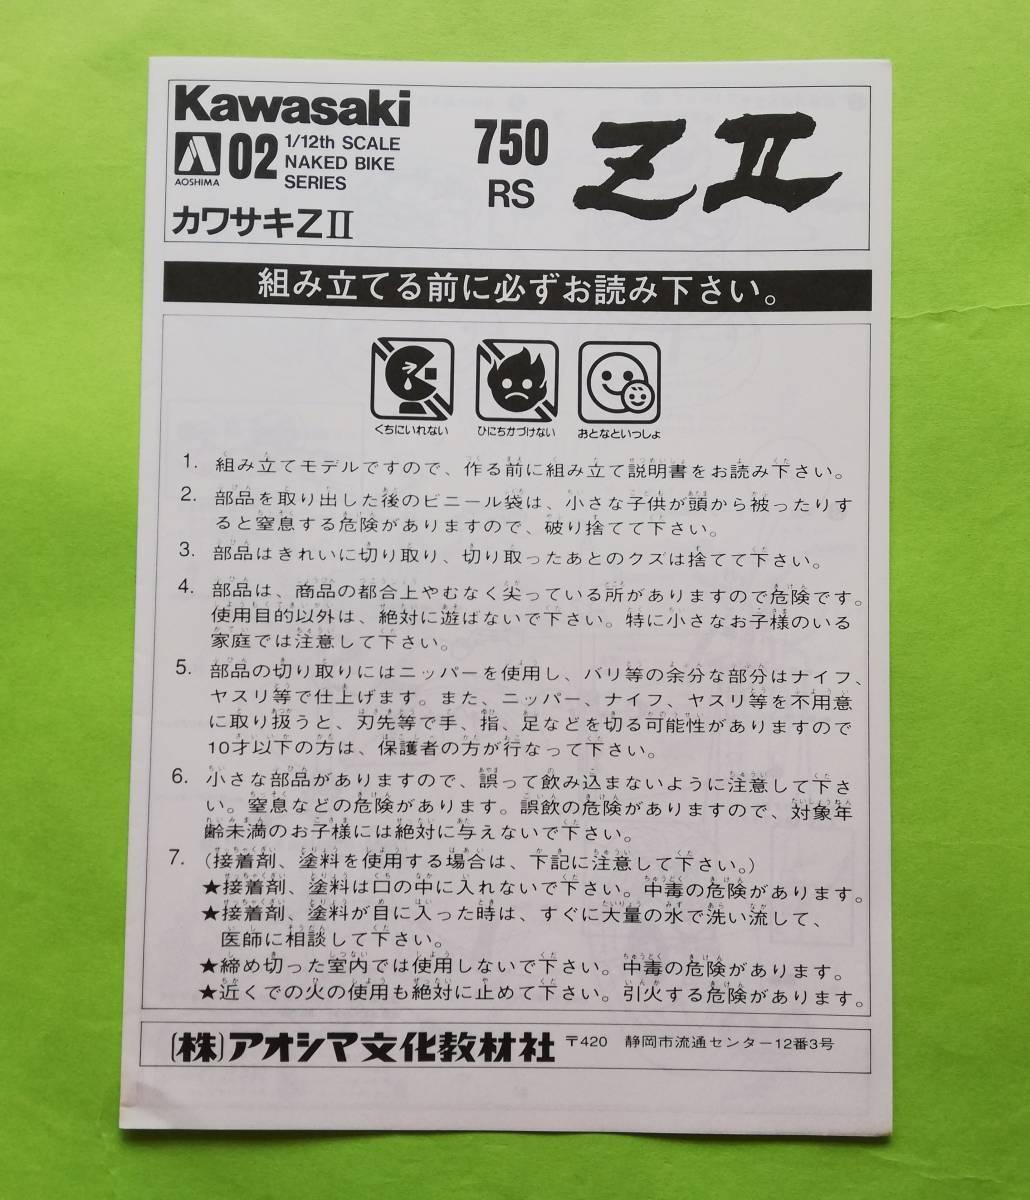 d8. (説明書) アオシマ 1/12 カワサキ 750RS ZⅡ ネイキッドバイク シリーズ No.2 【説明書のみ】_画像1